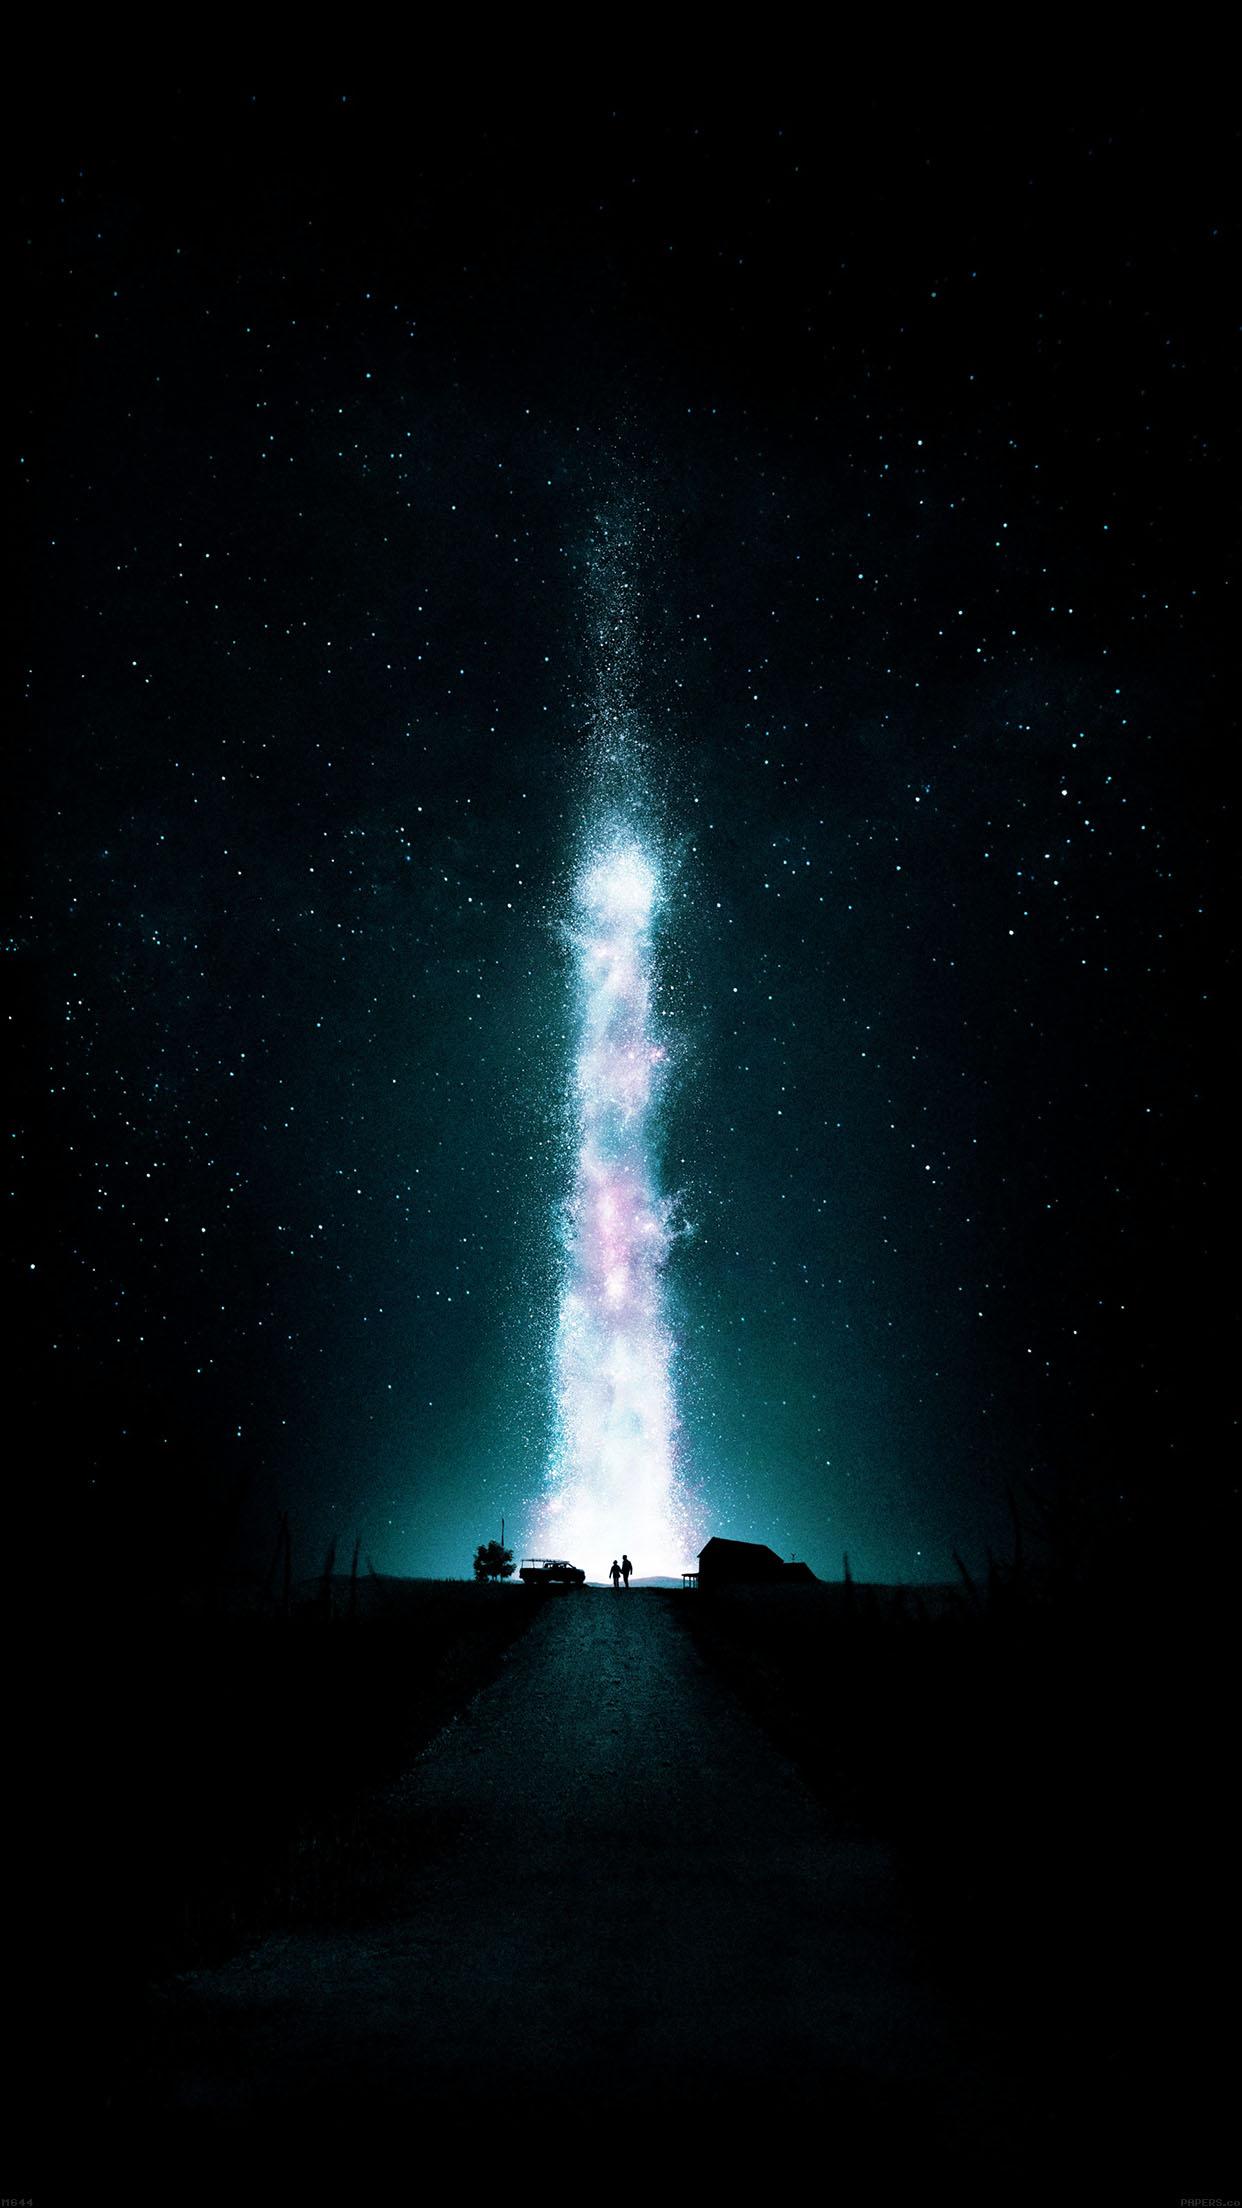 Interstellar Green Space Night Stars Fire Best Android Wallpaper